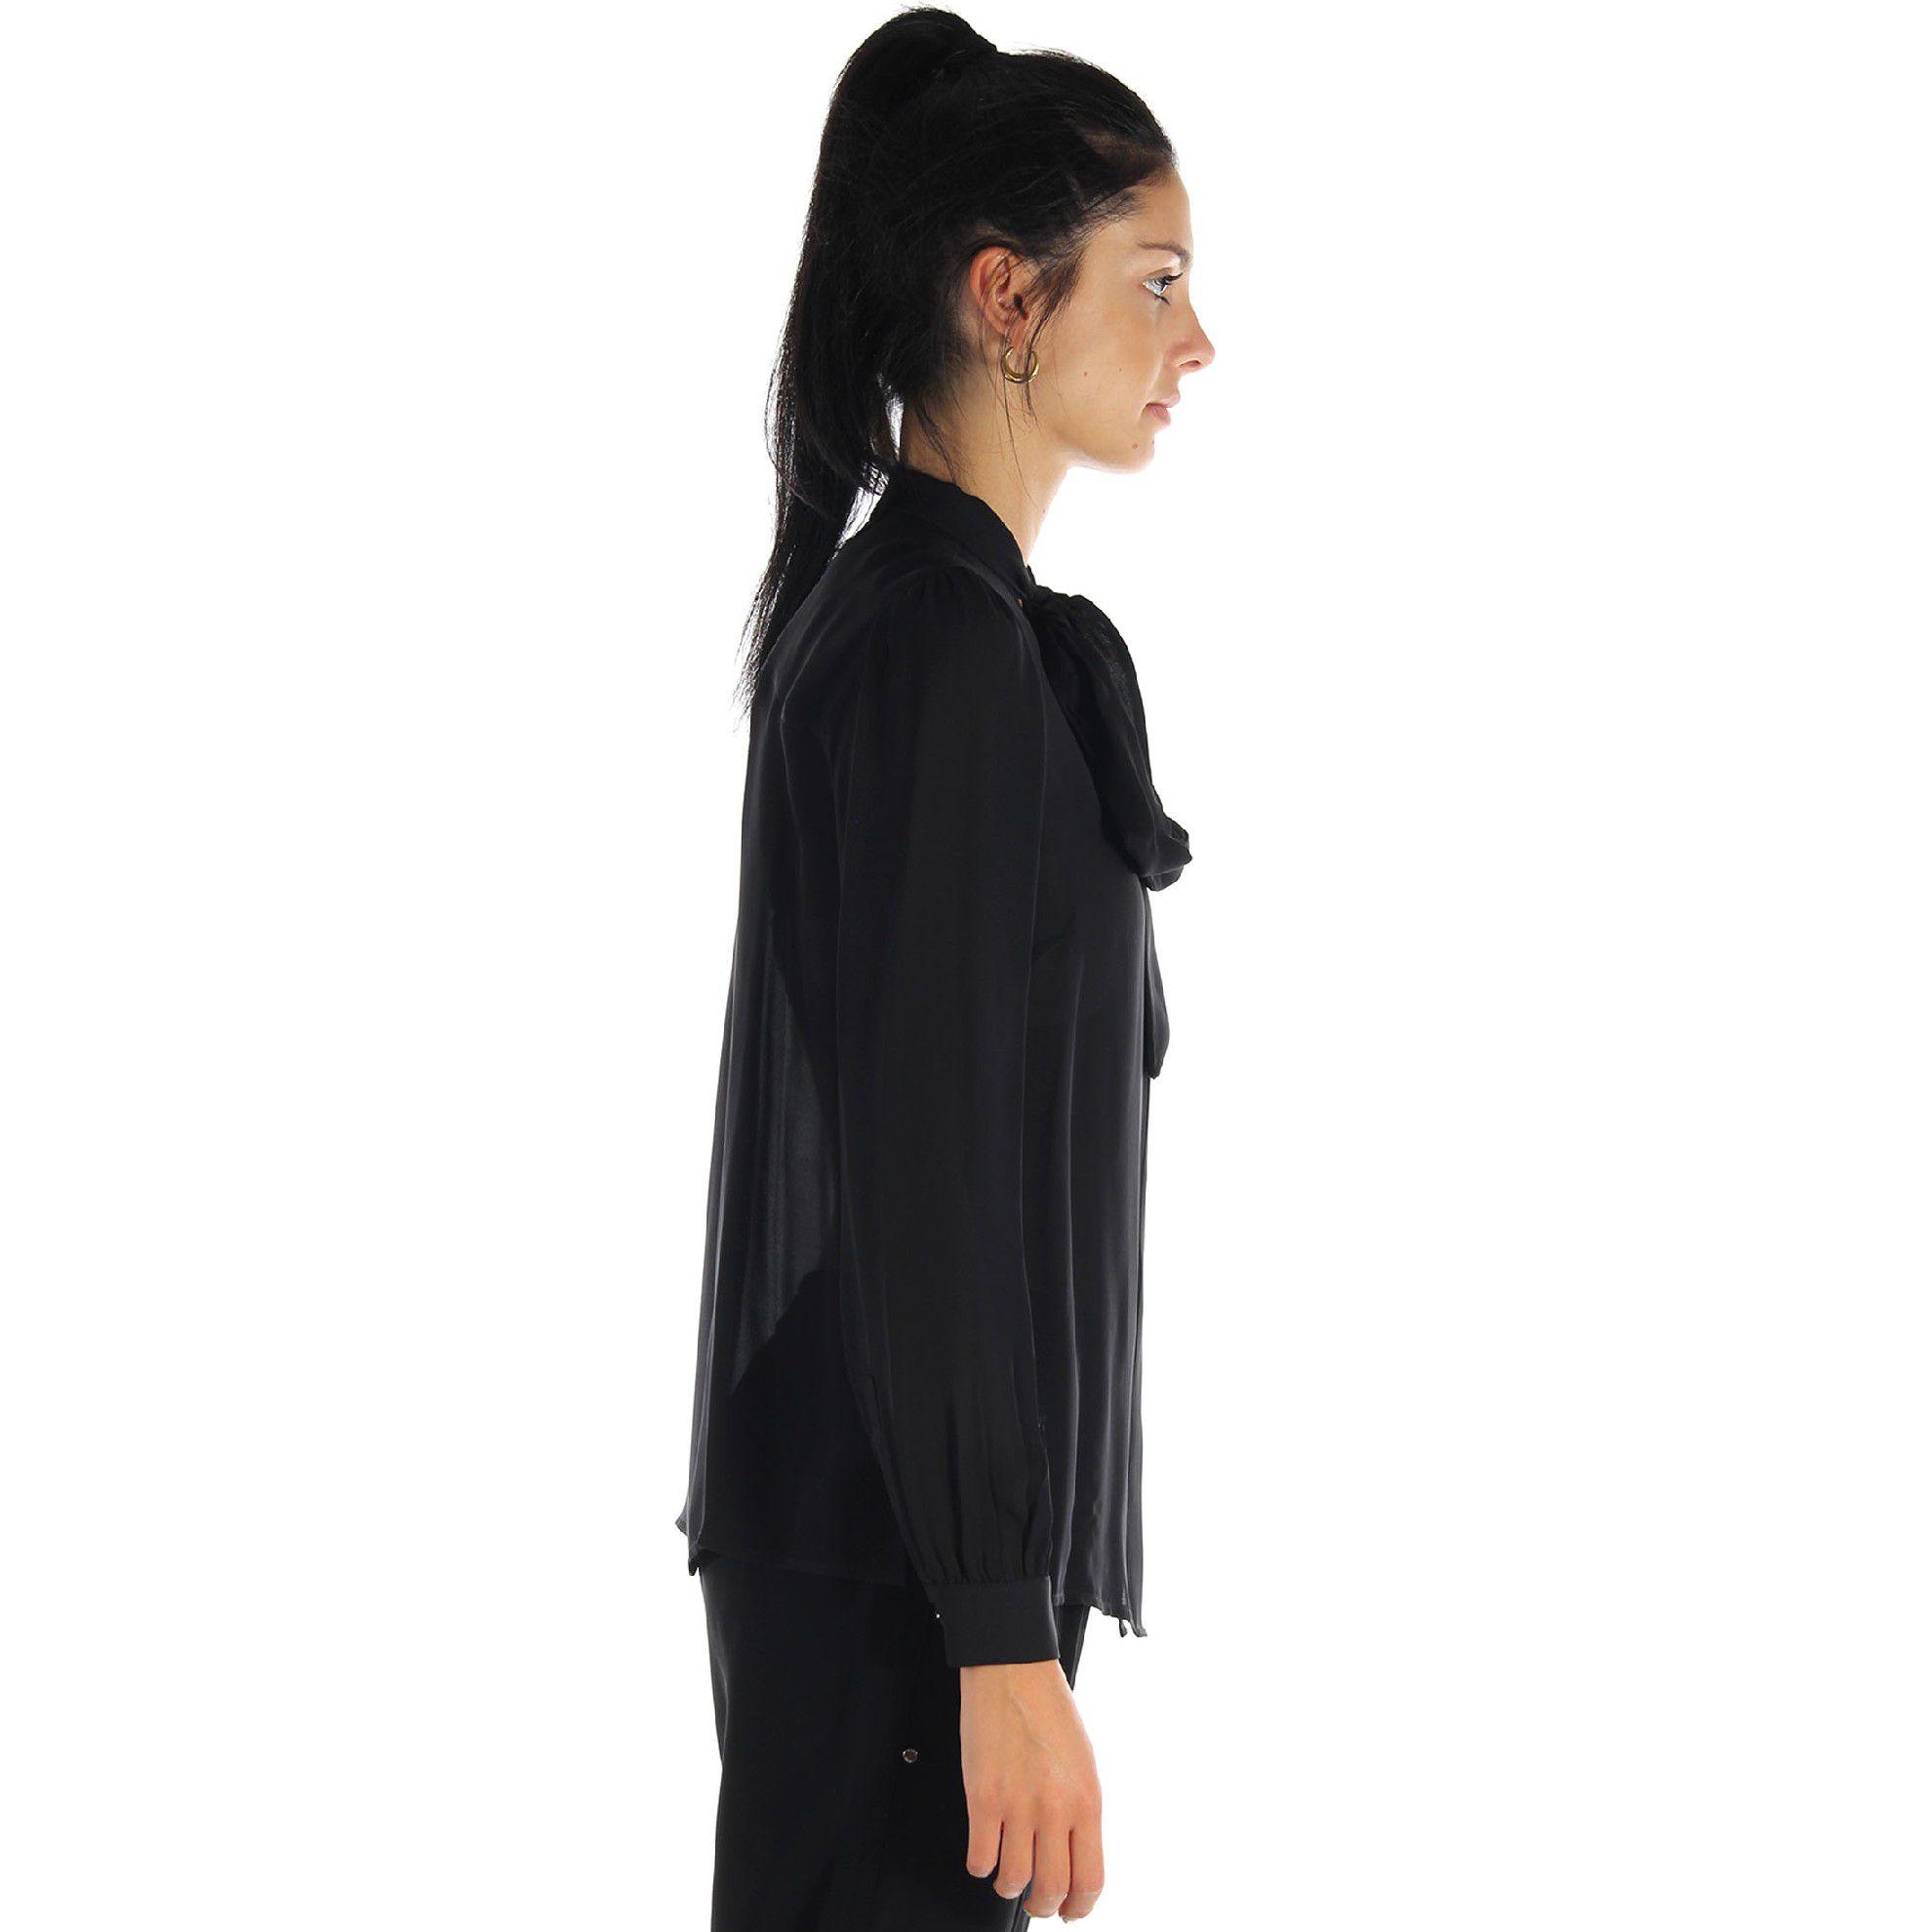 Michael kors camicia 100% seta da donna